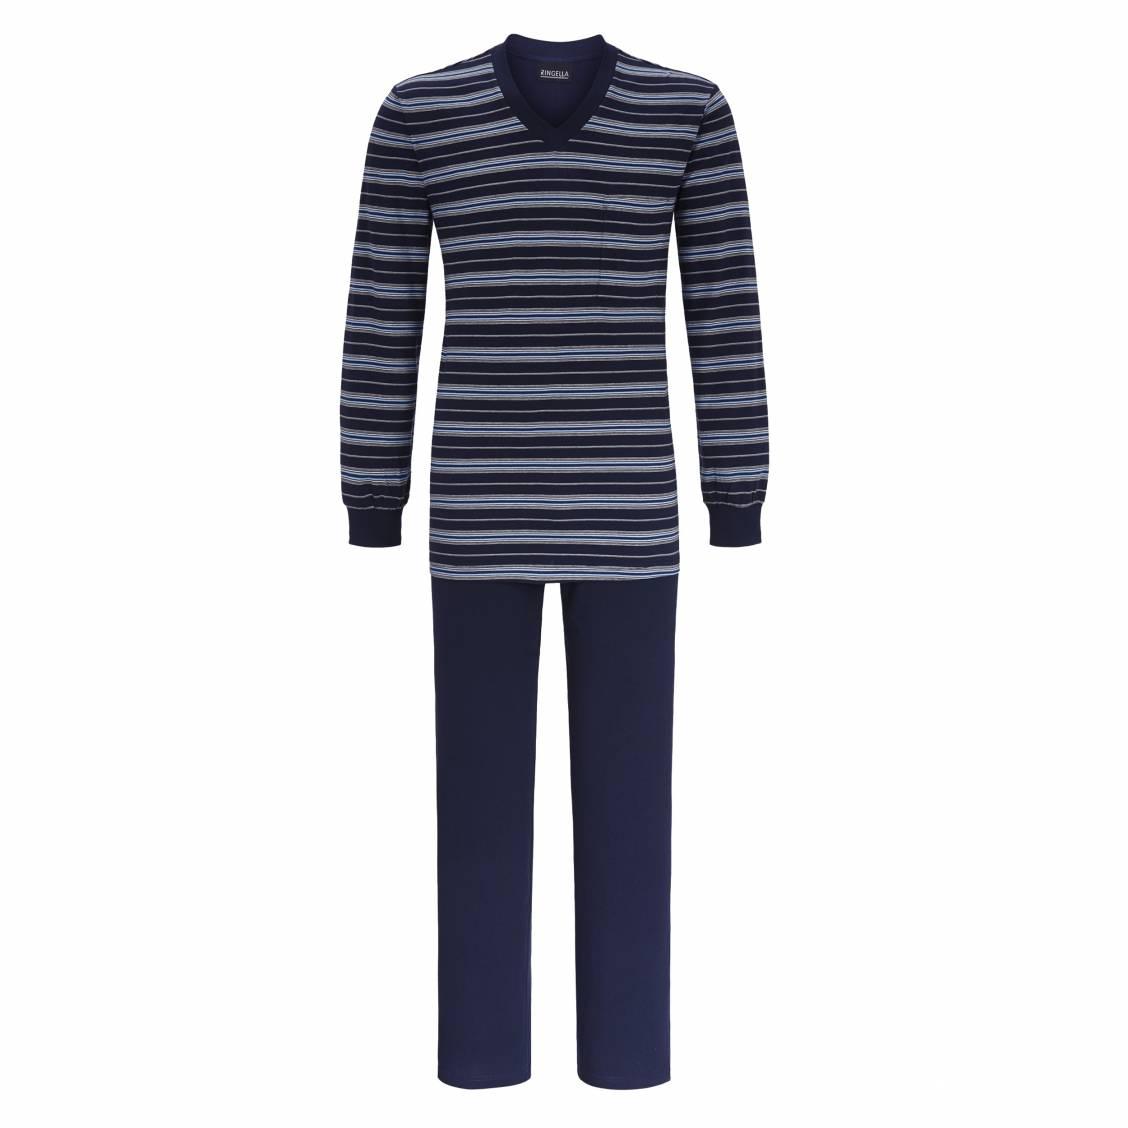 b70202ea84d 75183-ringella-h18-pyjama-8541218-286-night-pyjama-long-ringella-en-xxx--tee-shirt-col-v-manches-longues-bleu-marine-a-rayures-bleu-ciel- grises-et-blanches- ...